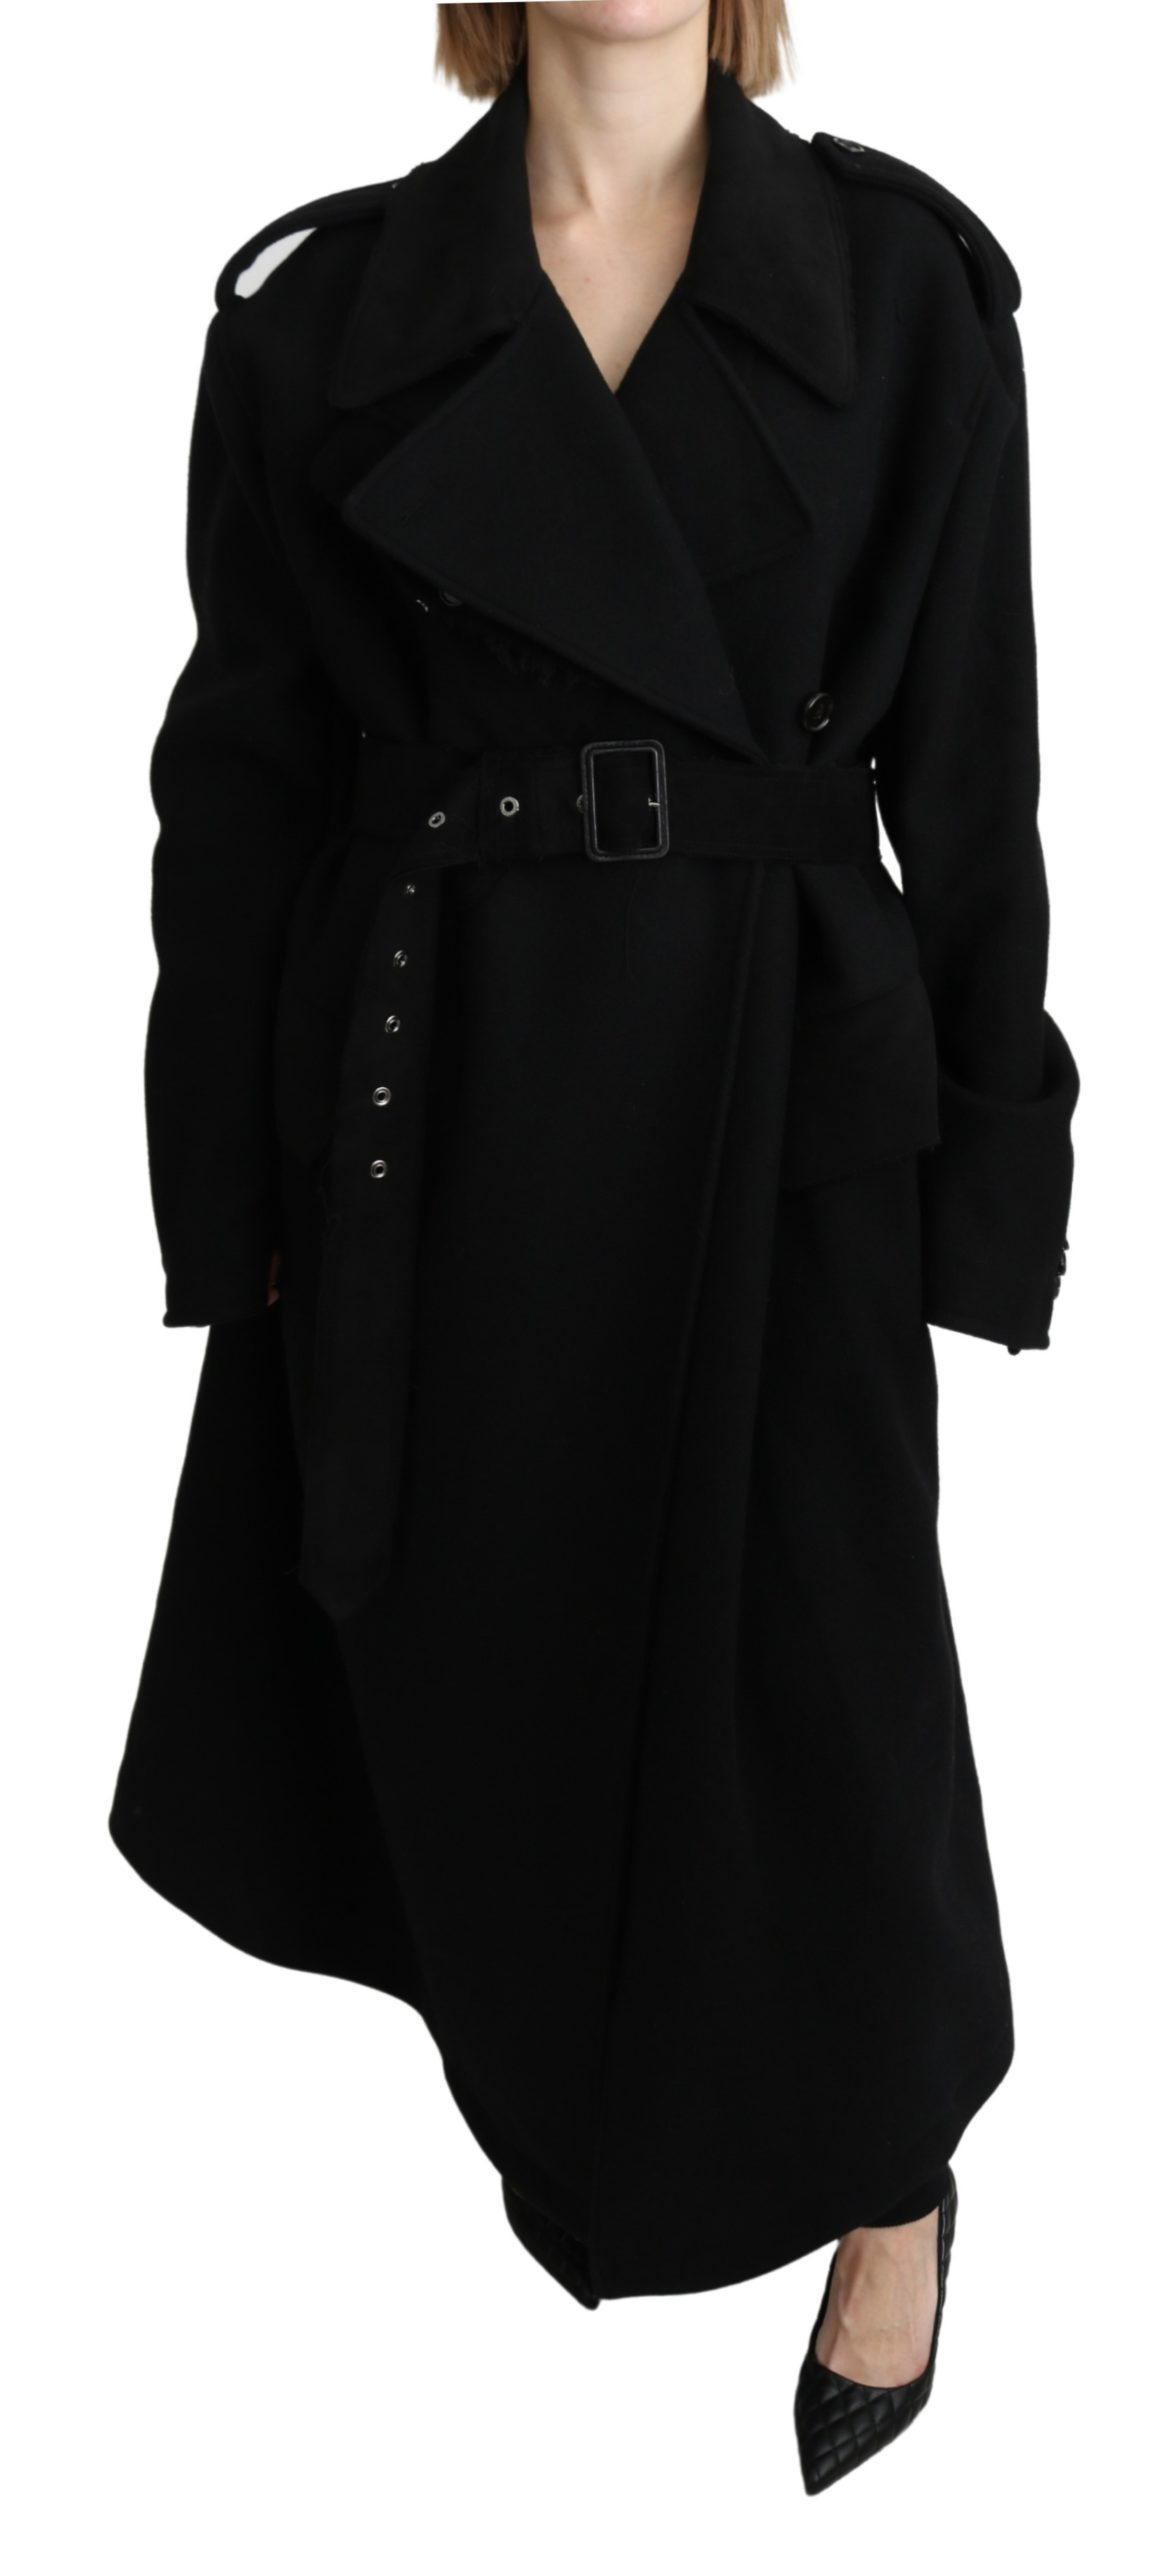 Dolce & Gabbana Women's Wool Trenchcoat Jacket Black JKT2638 - IT40 | M